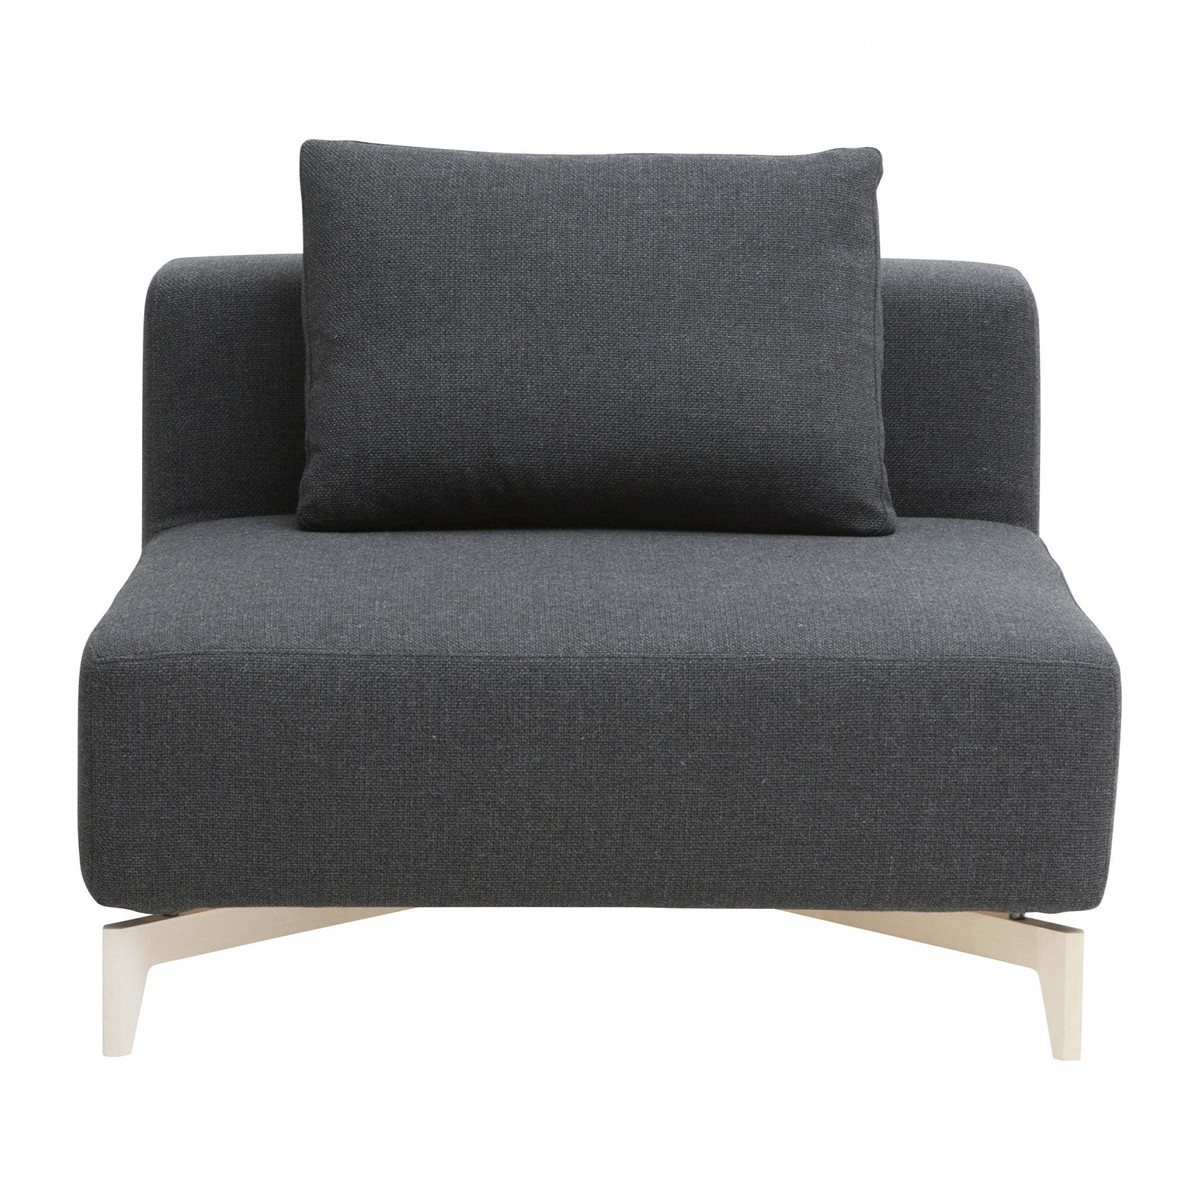 softline sofa sleep day bed sofa softline ambientedirect. Black Bedroom Furniture Sets. Home Design Ideas